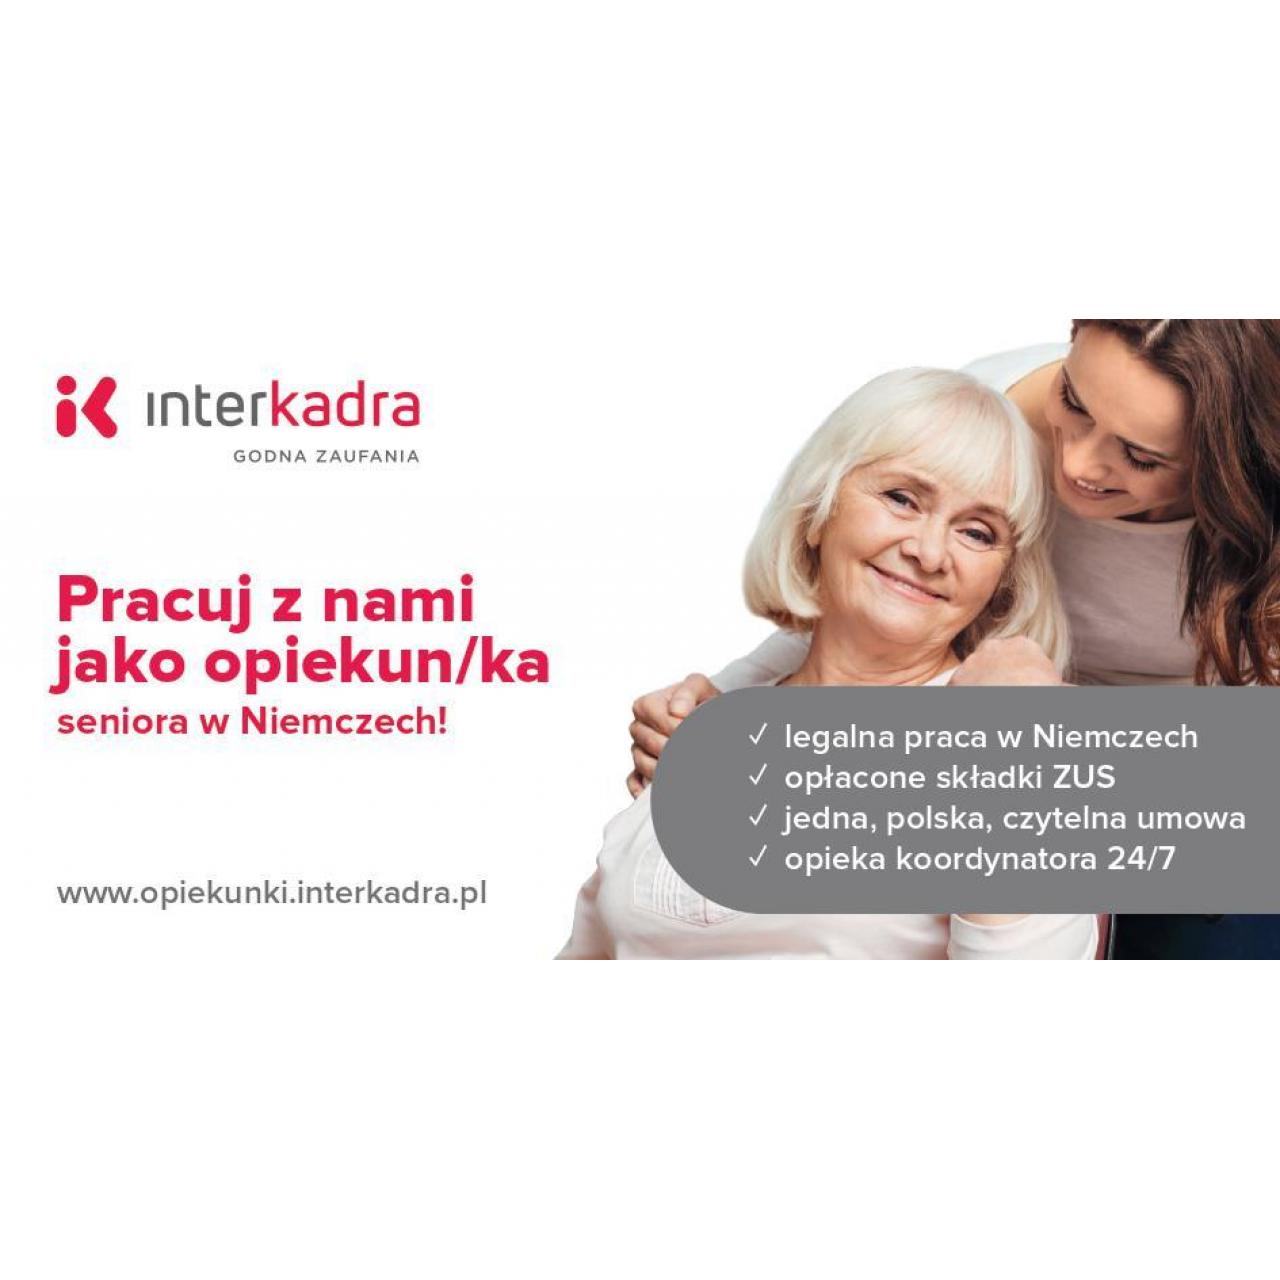 Opiekun/ka do Seniora Uwe po udarze, do 1400 EUR